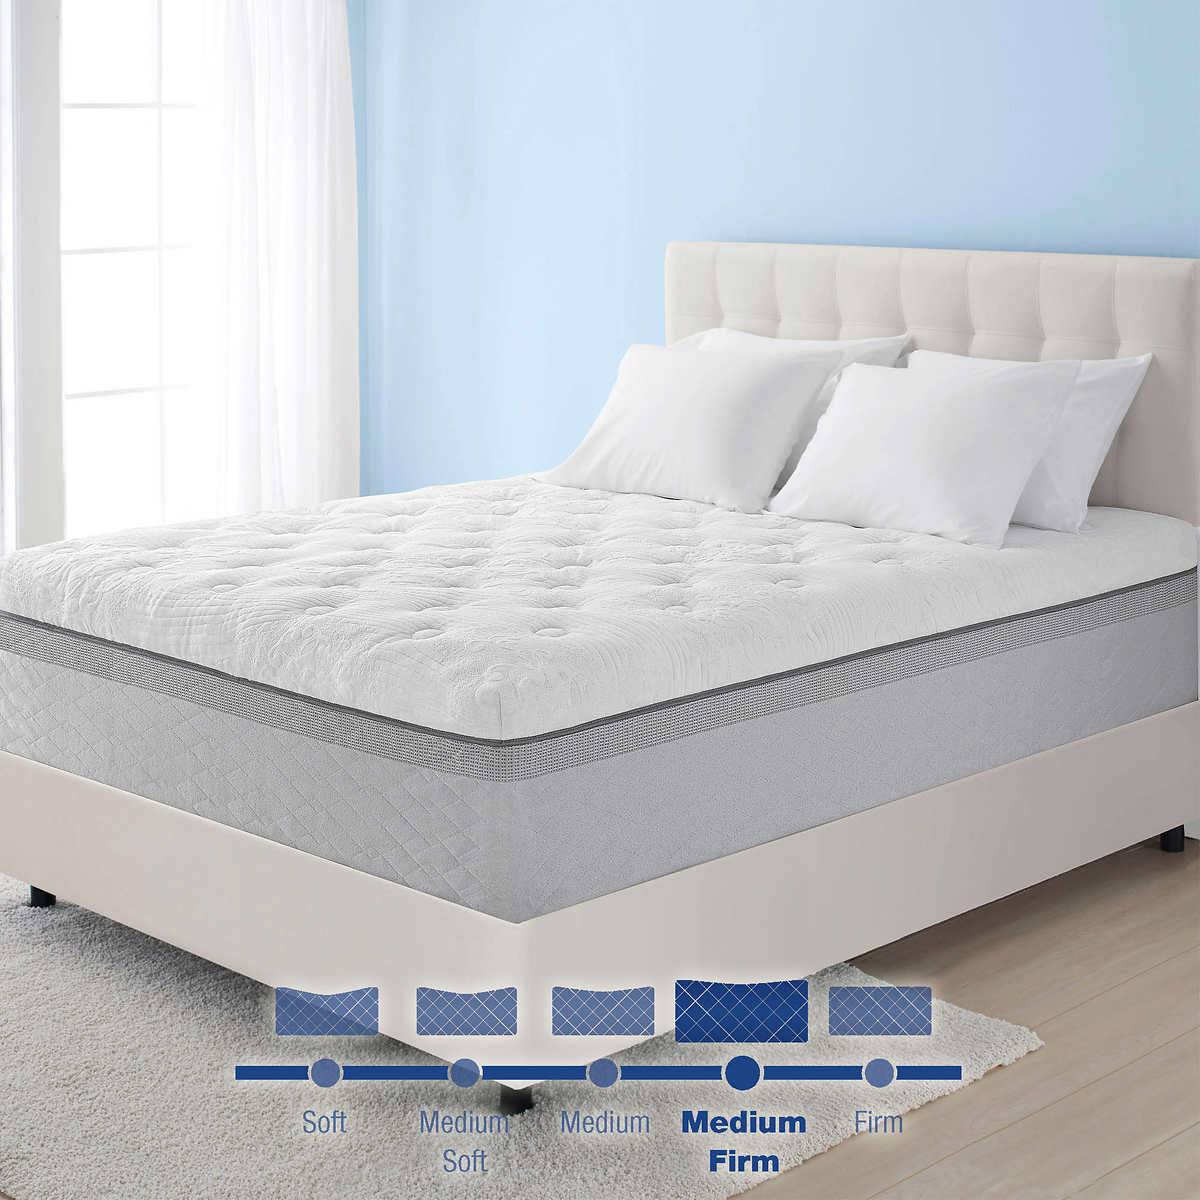 Novaform® Comfort Grande™ Gel Memory Foam King Mattress